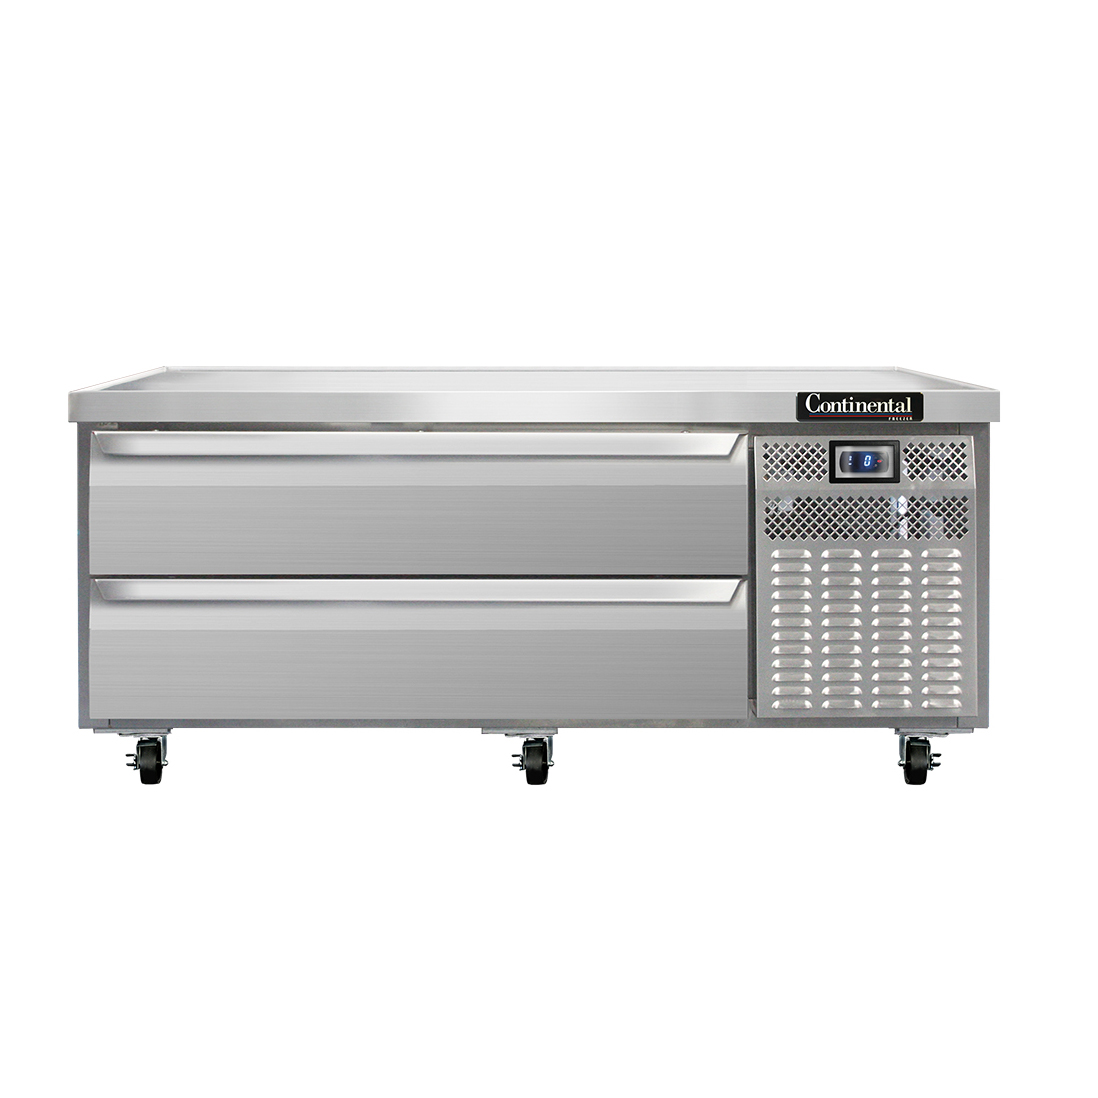 Continental Refrigerator D60GFN equipment stand, freezer base